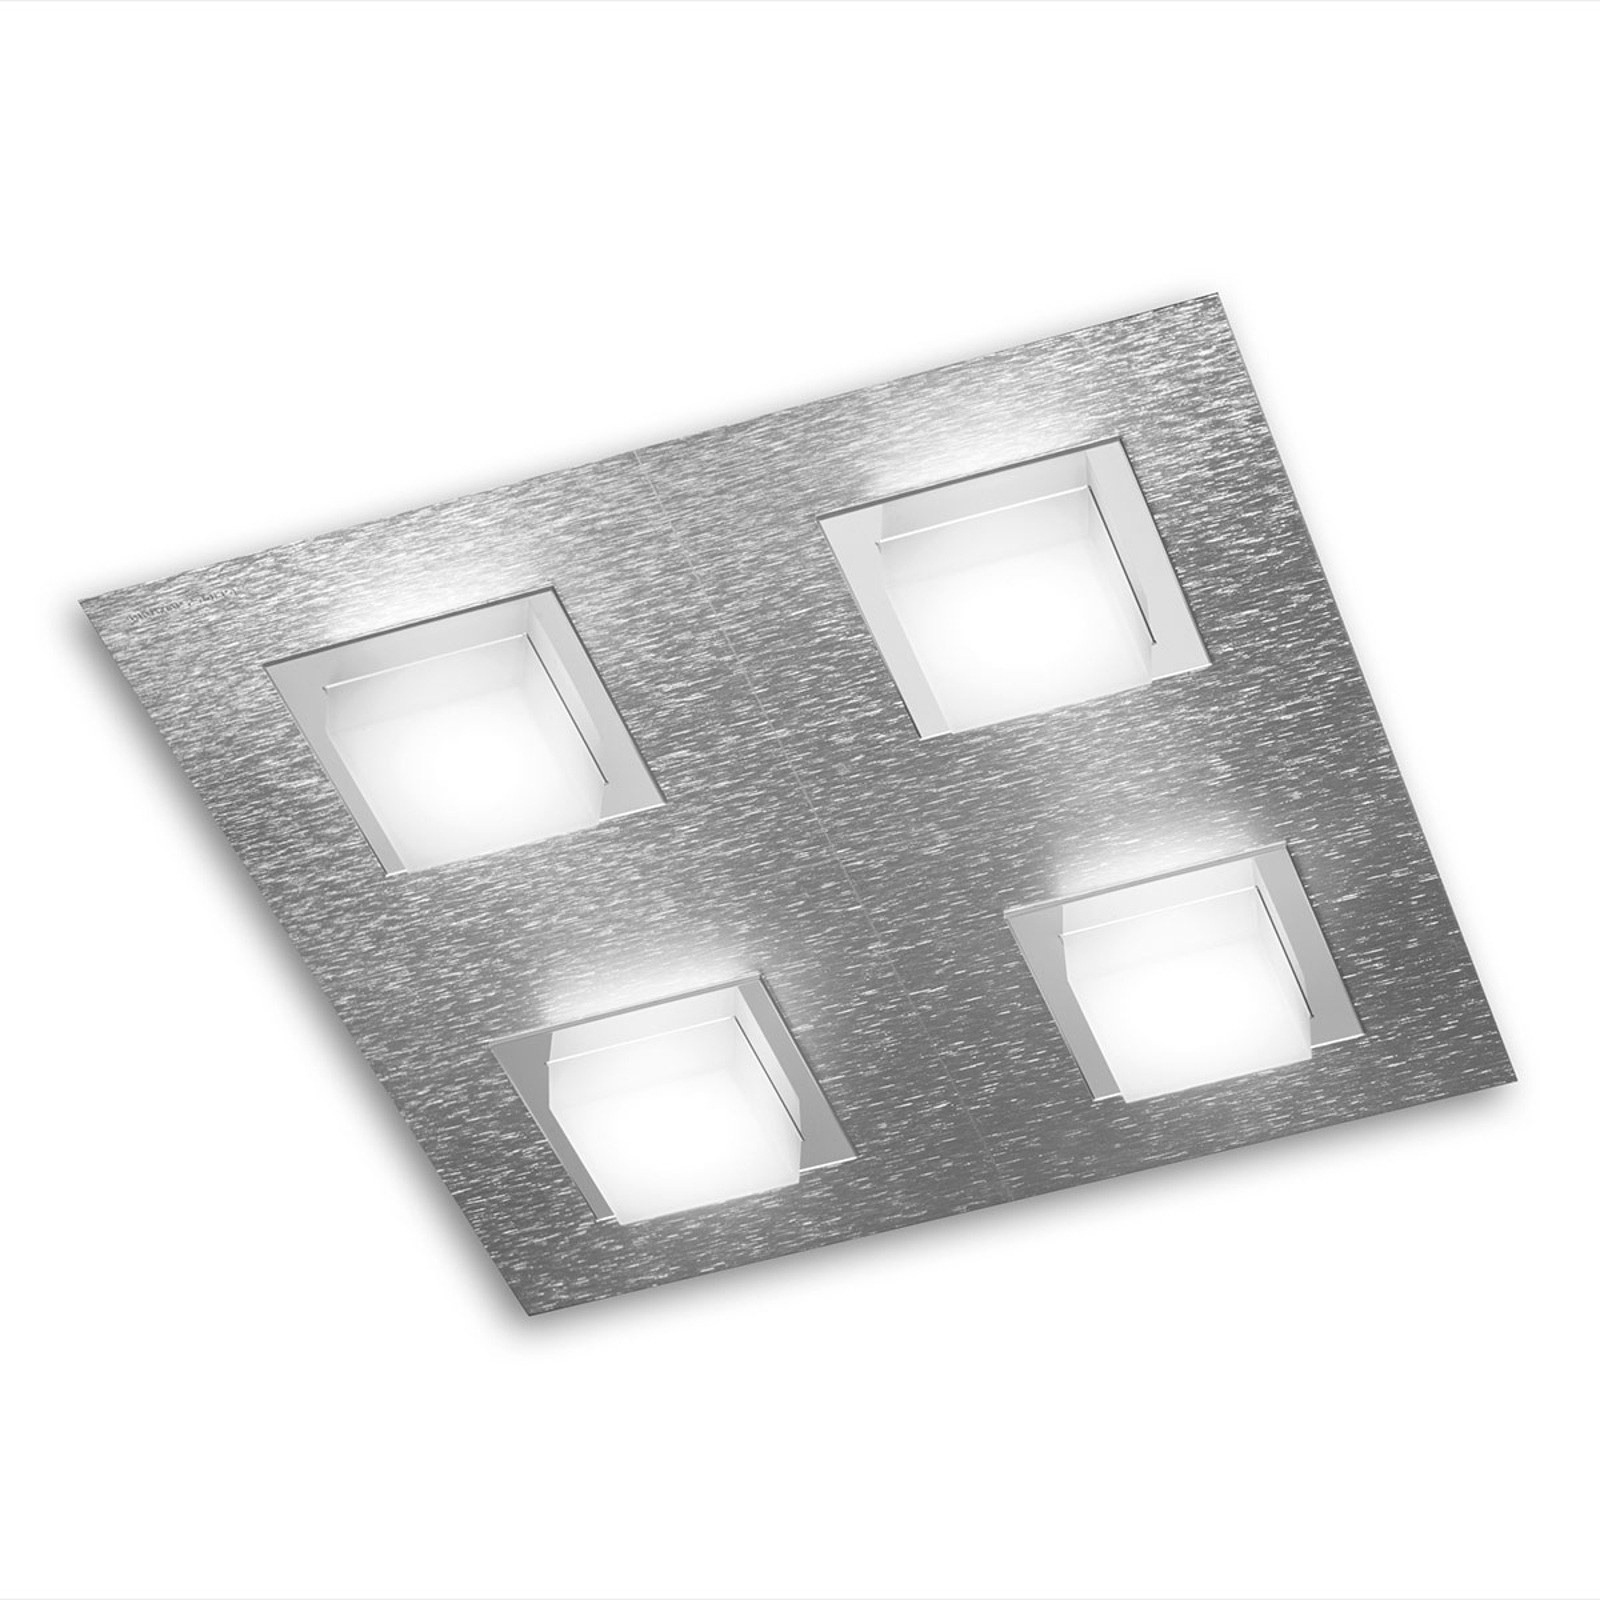 GROSSMANN Basic lampa sufitowa LED 4-pkt aluminium